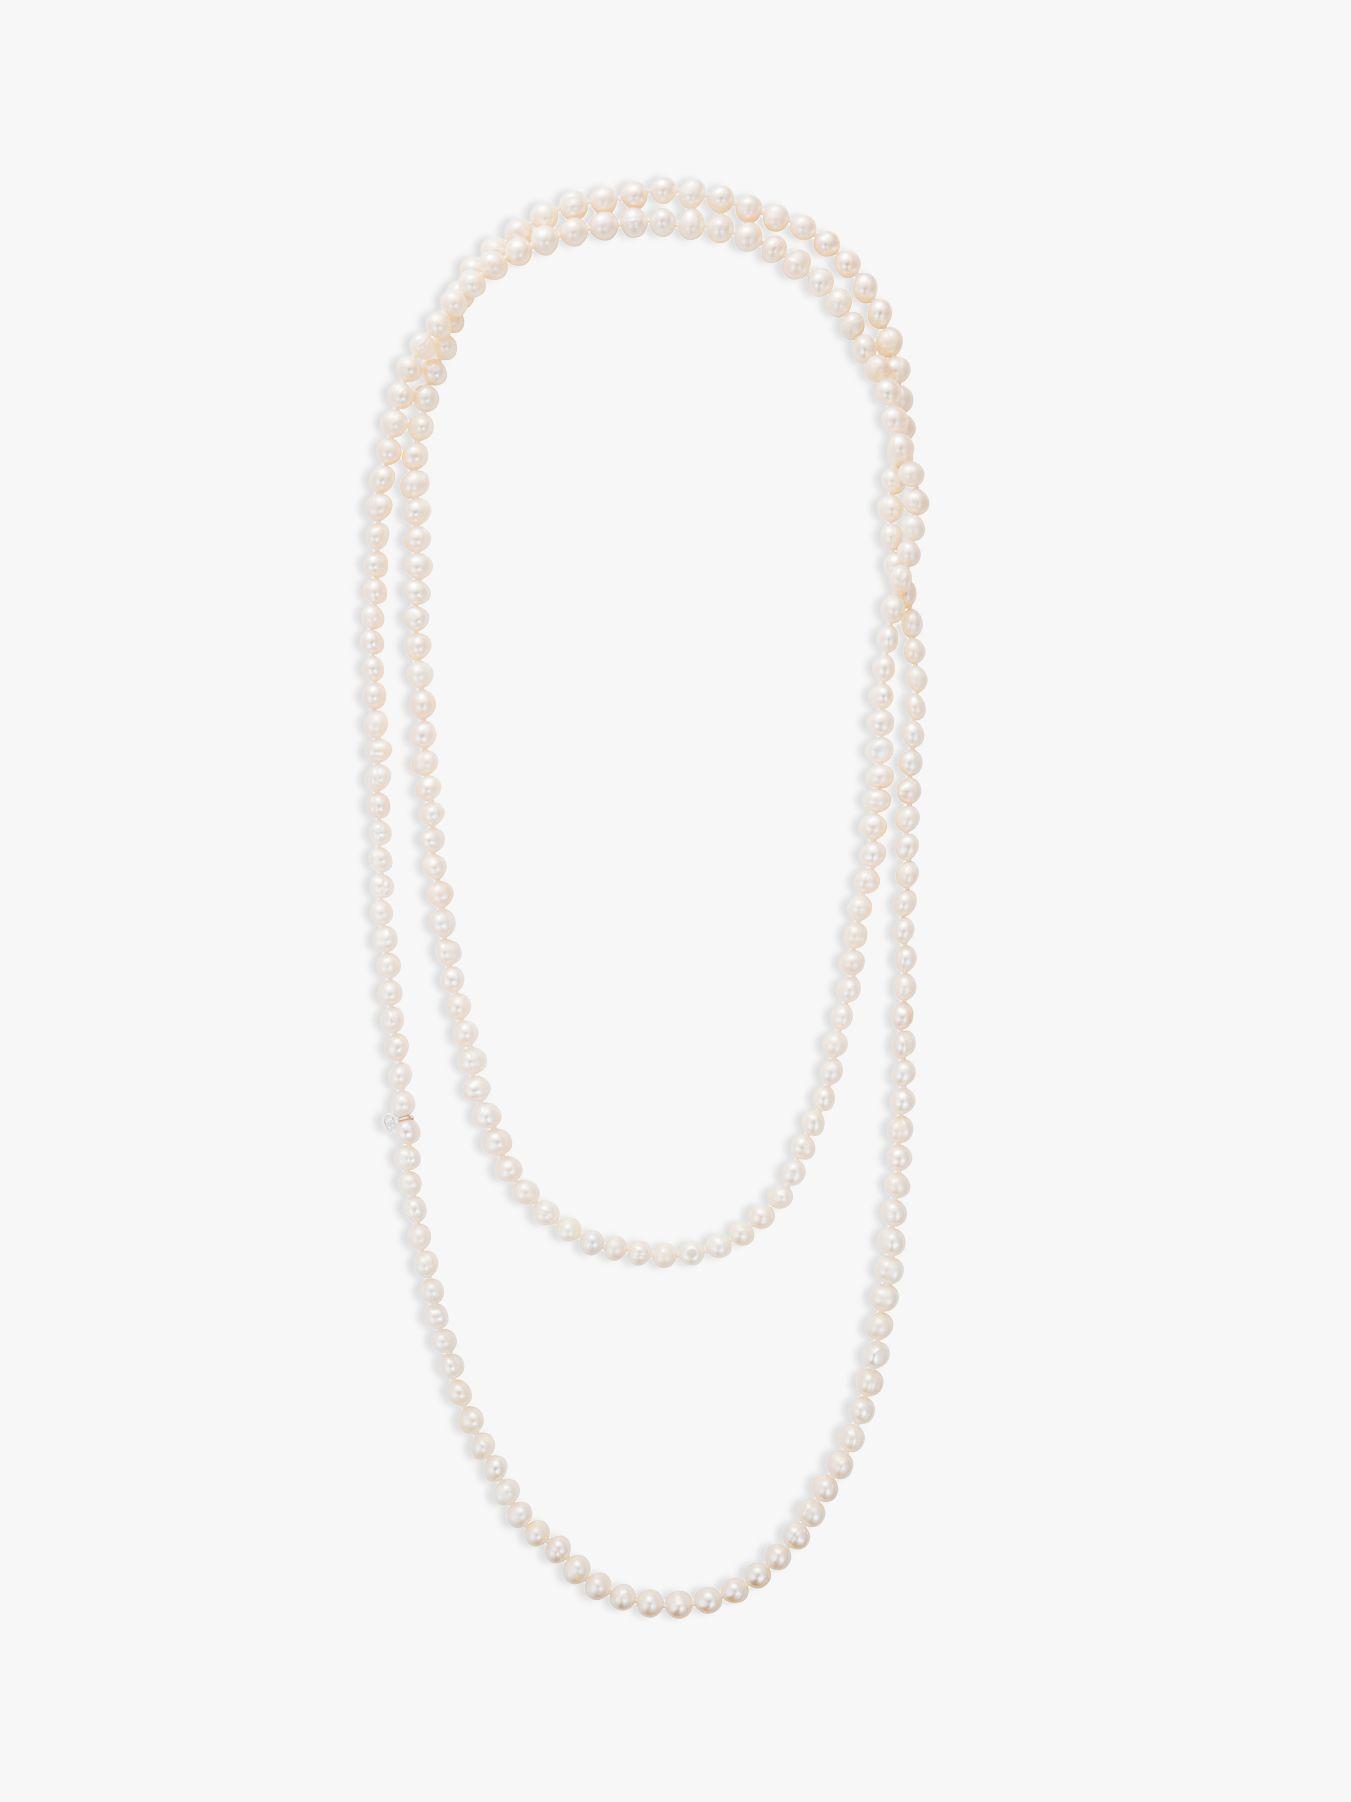 Claudia Bradby Claudia Bradby Long Freshwater Pearl Rope Necklace, White